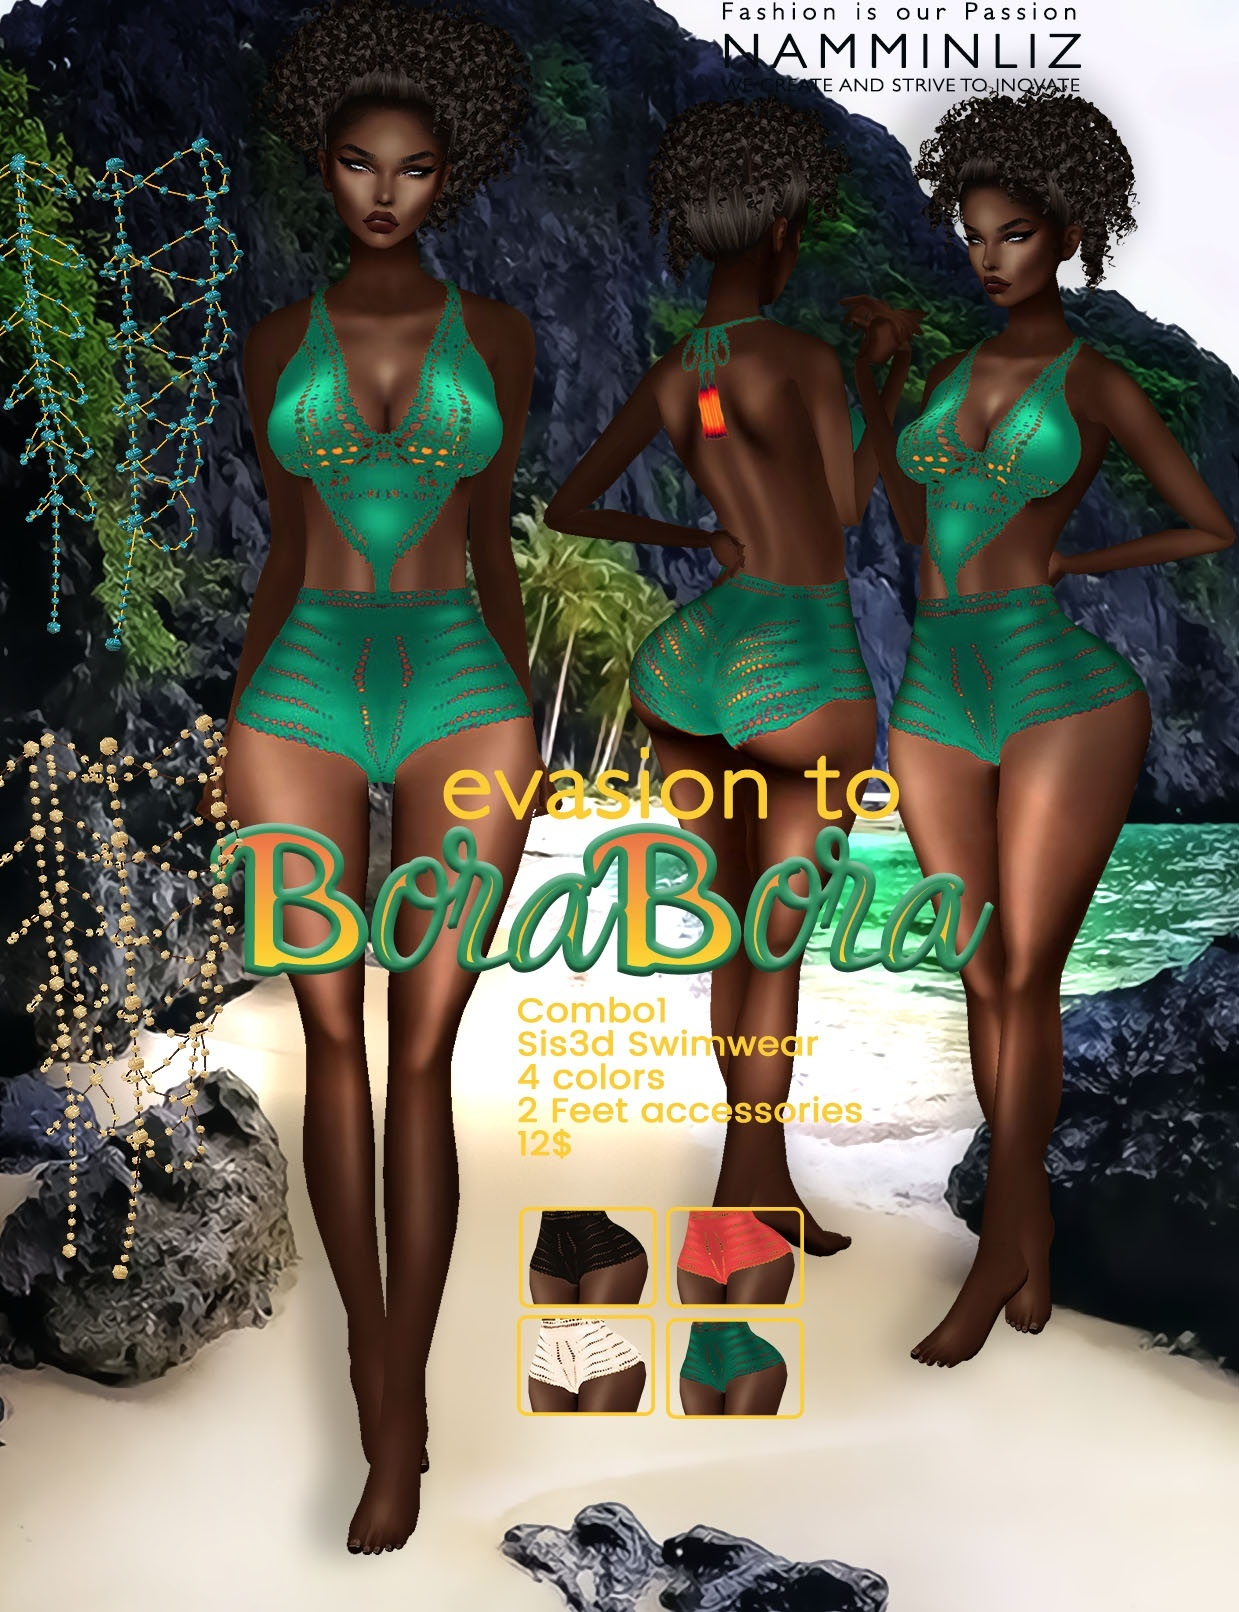 Evasion to Bora Bora combo1 Sis3d swimwear imvu NAMMINLIZ